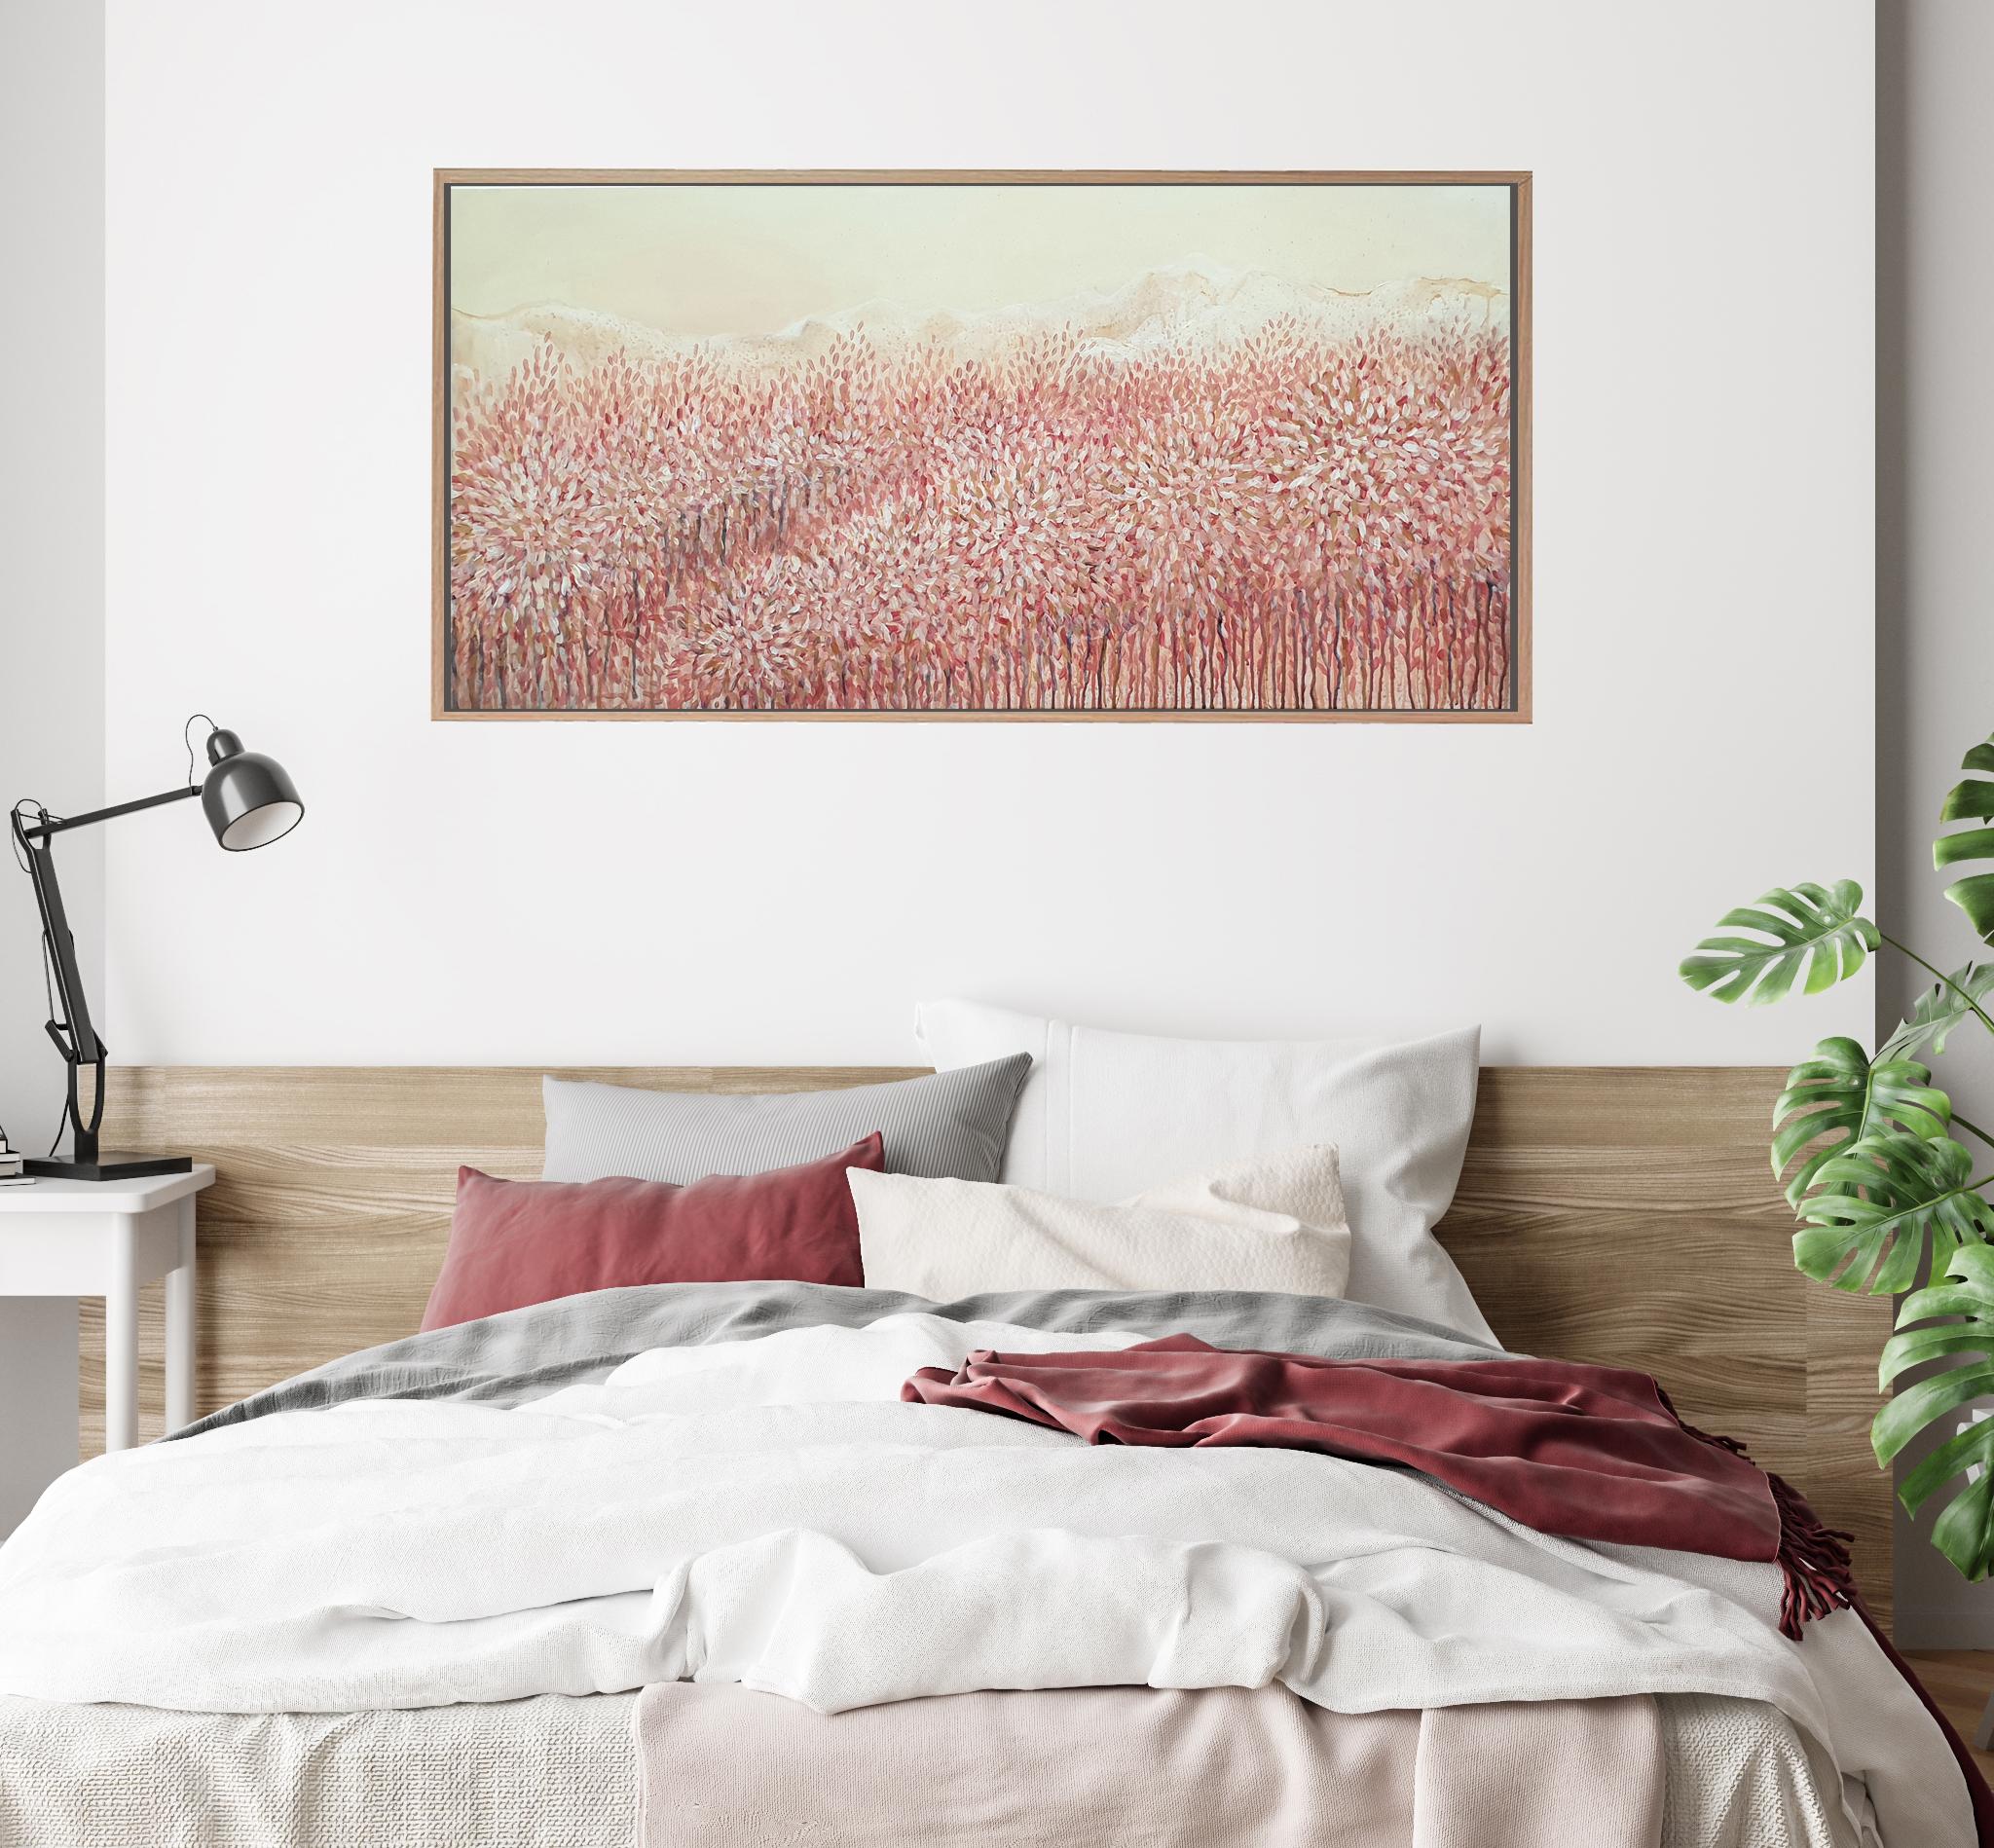 Artist Leni Kae Zoom Bedroom Interior Design Art Autumn Colours Calling Abstract Landscape